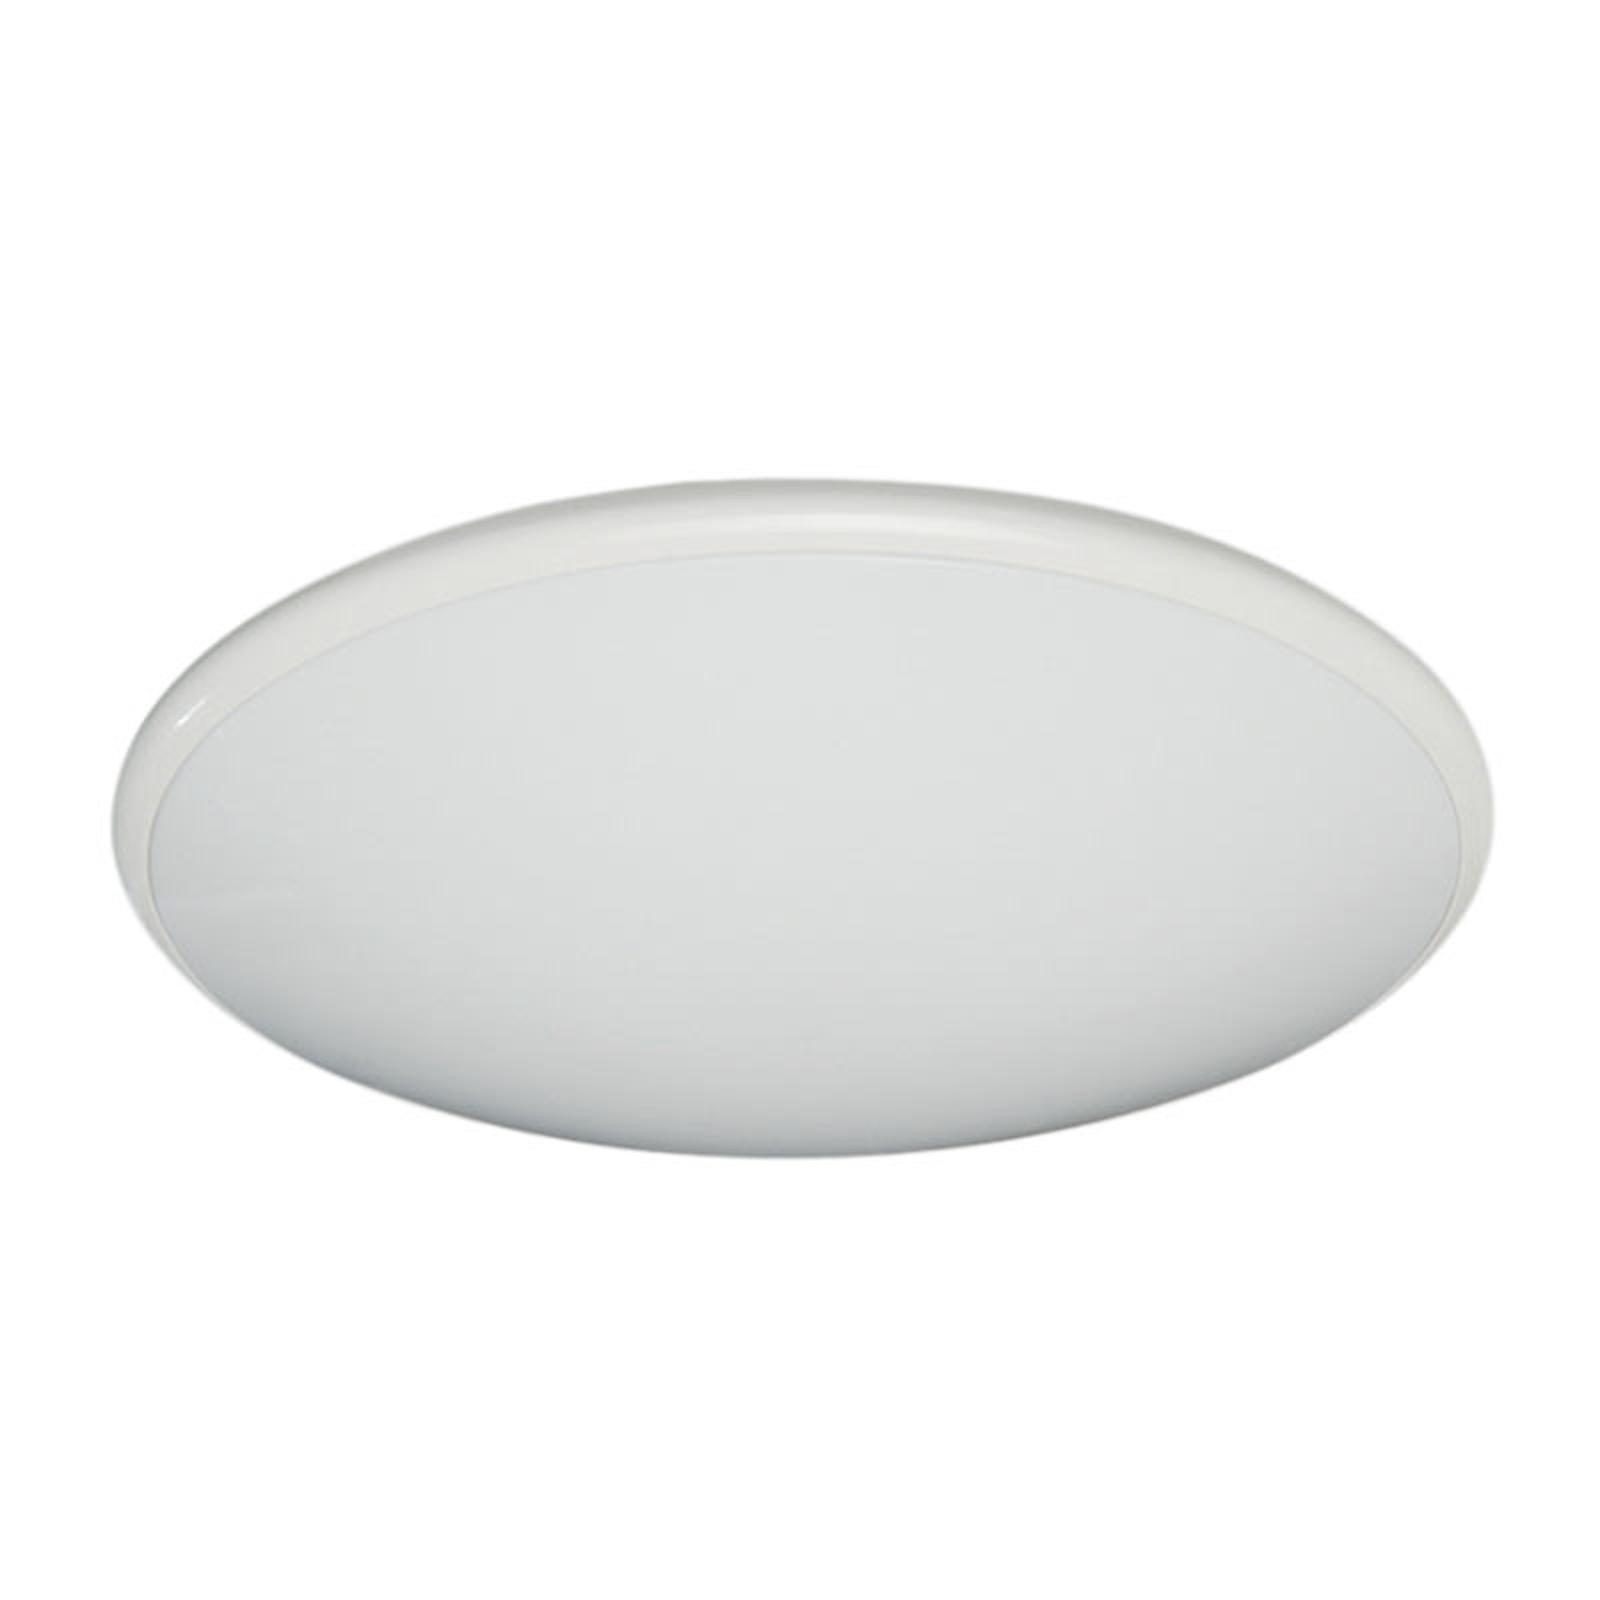 Acquista Plafoniera LED Sinus-S425 1000 HF 42,5 cm